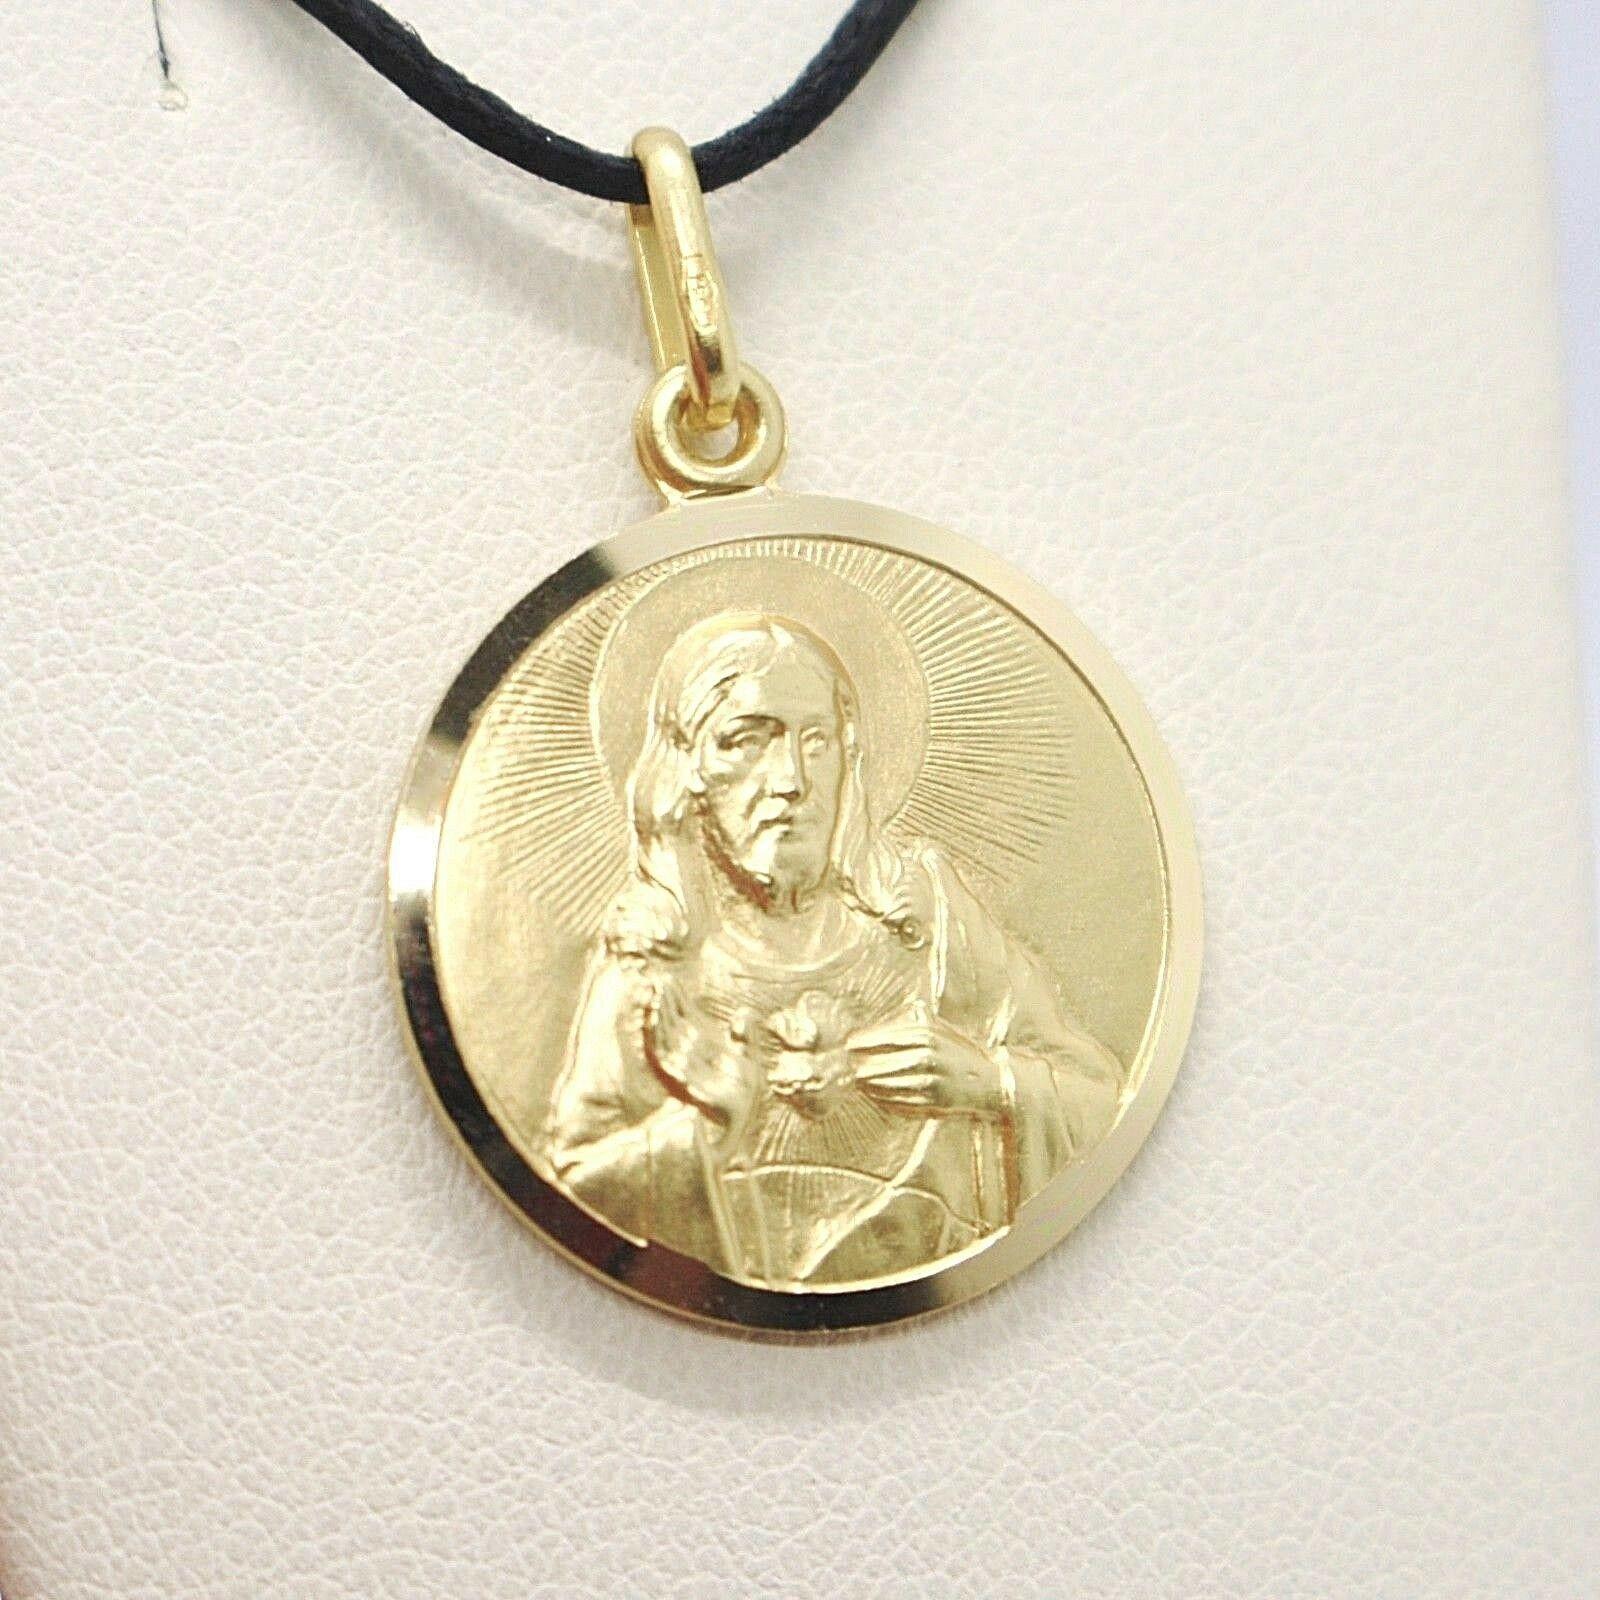 18K YELLOW GOLD SCAPULAR OUR LADY OF MOUNT CARMEL SACRED HEART MEDAL 15mm CARMEN